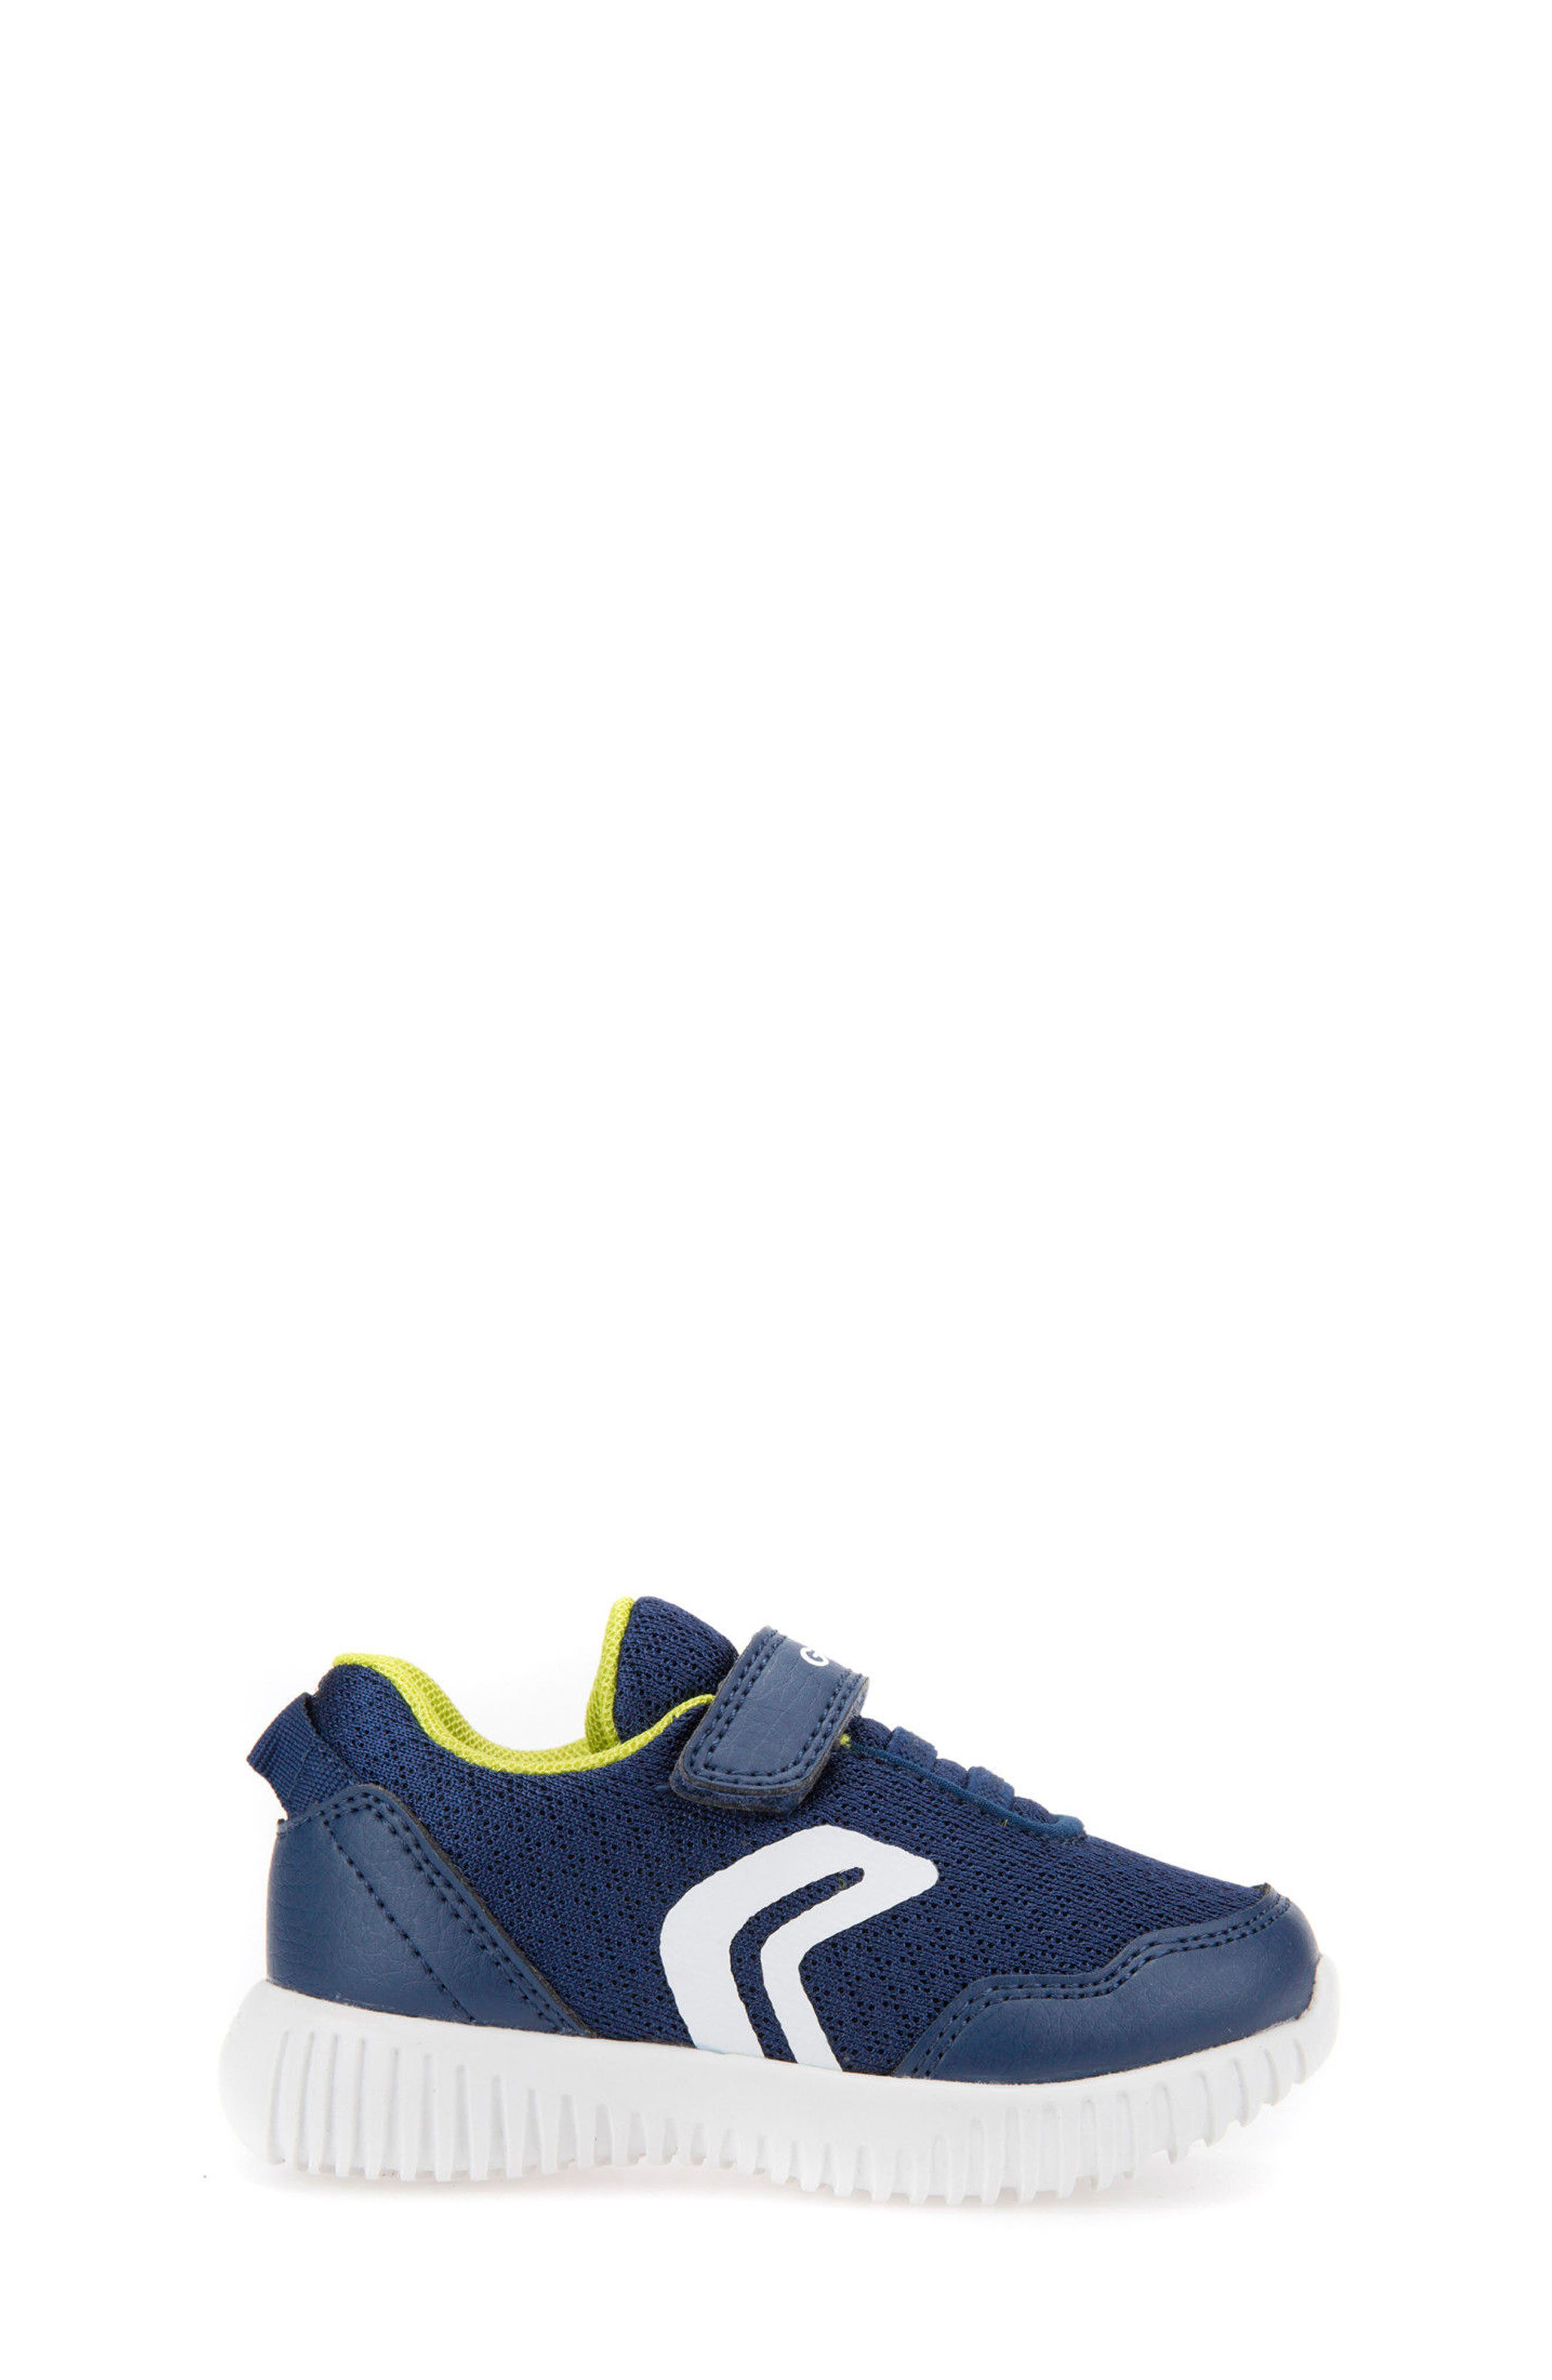 Alternate Image 3  - Geox Waviness Sneaker (Walker & Toddler)